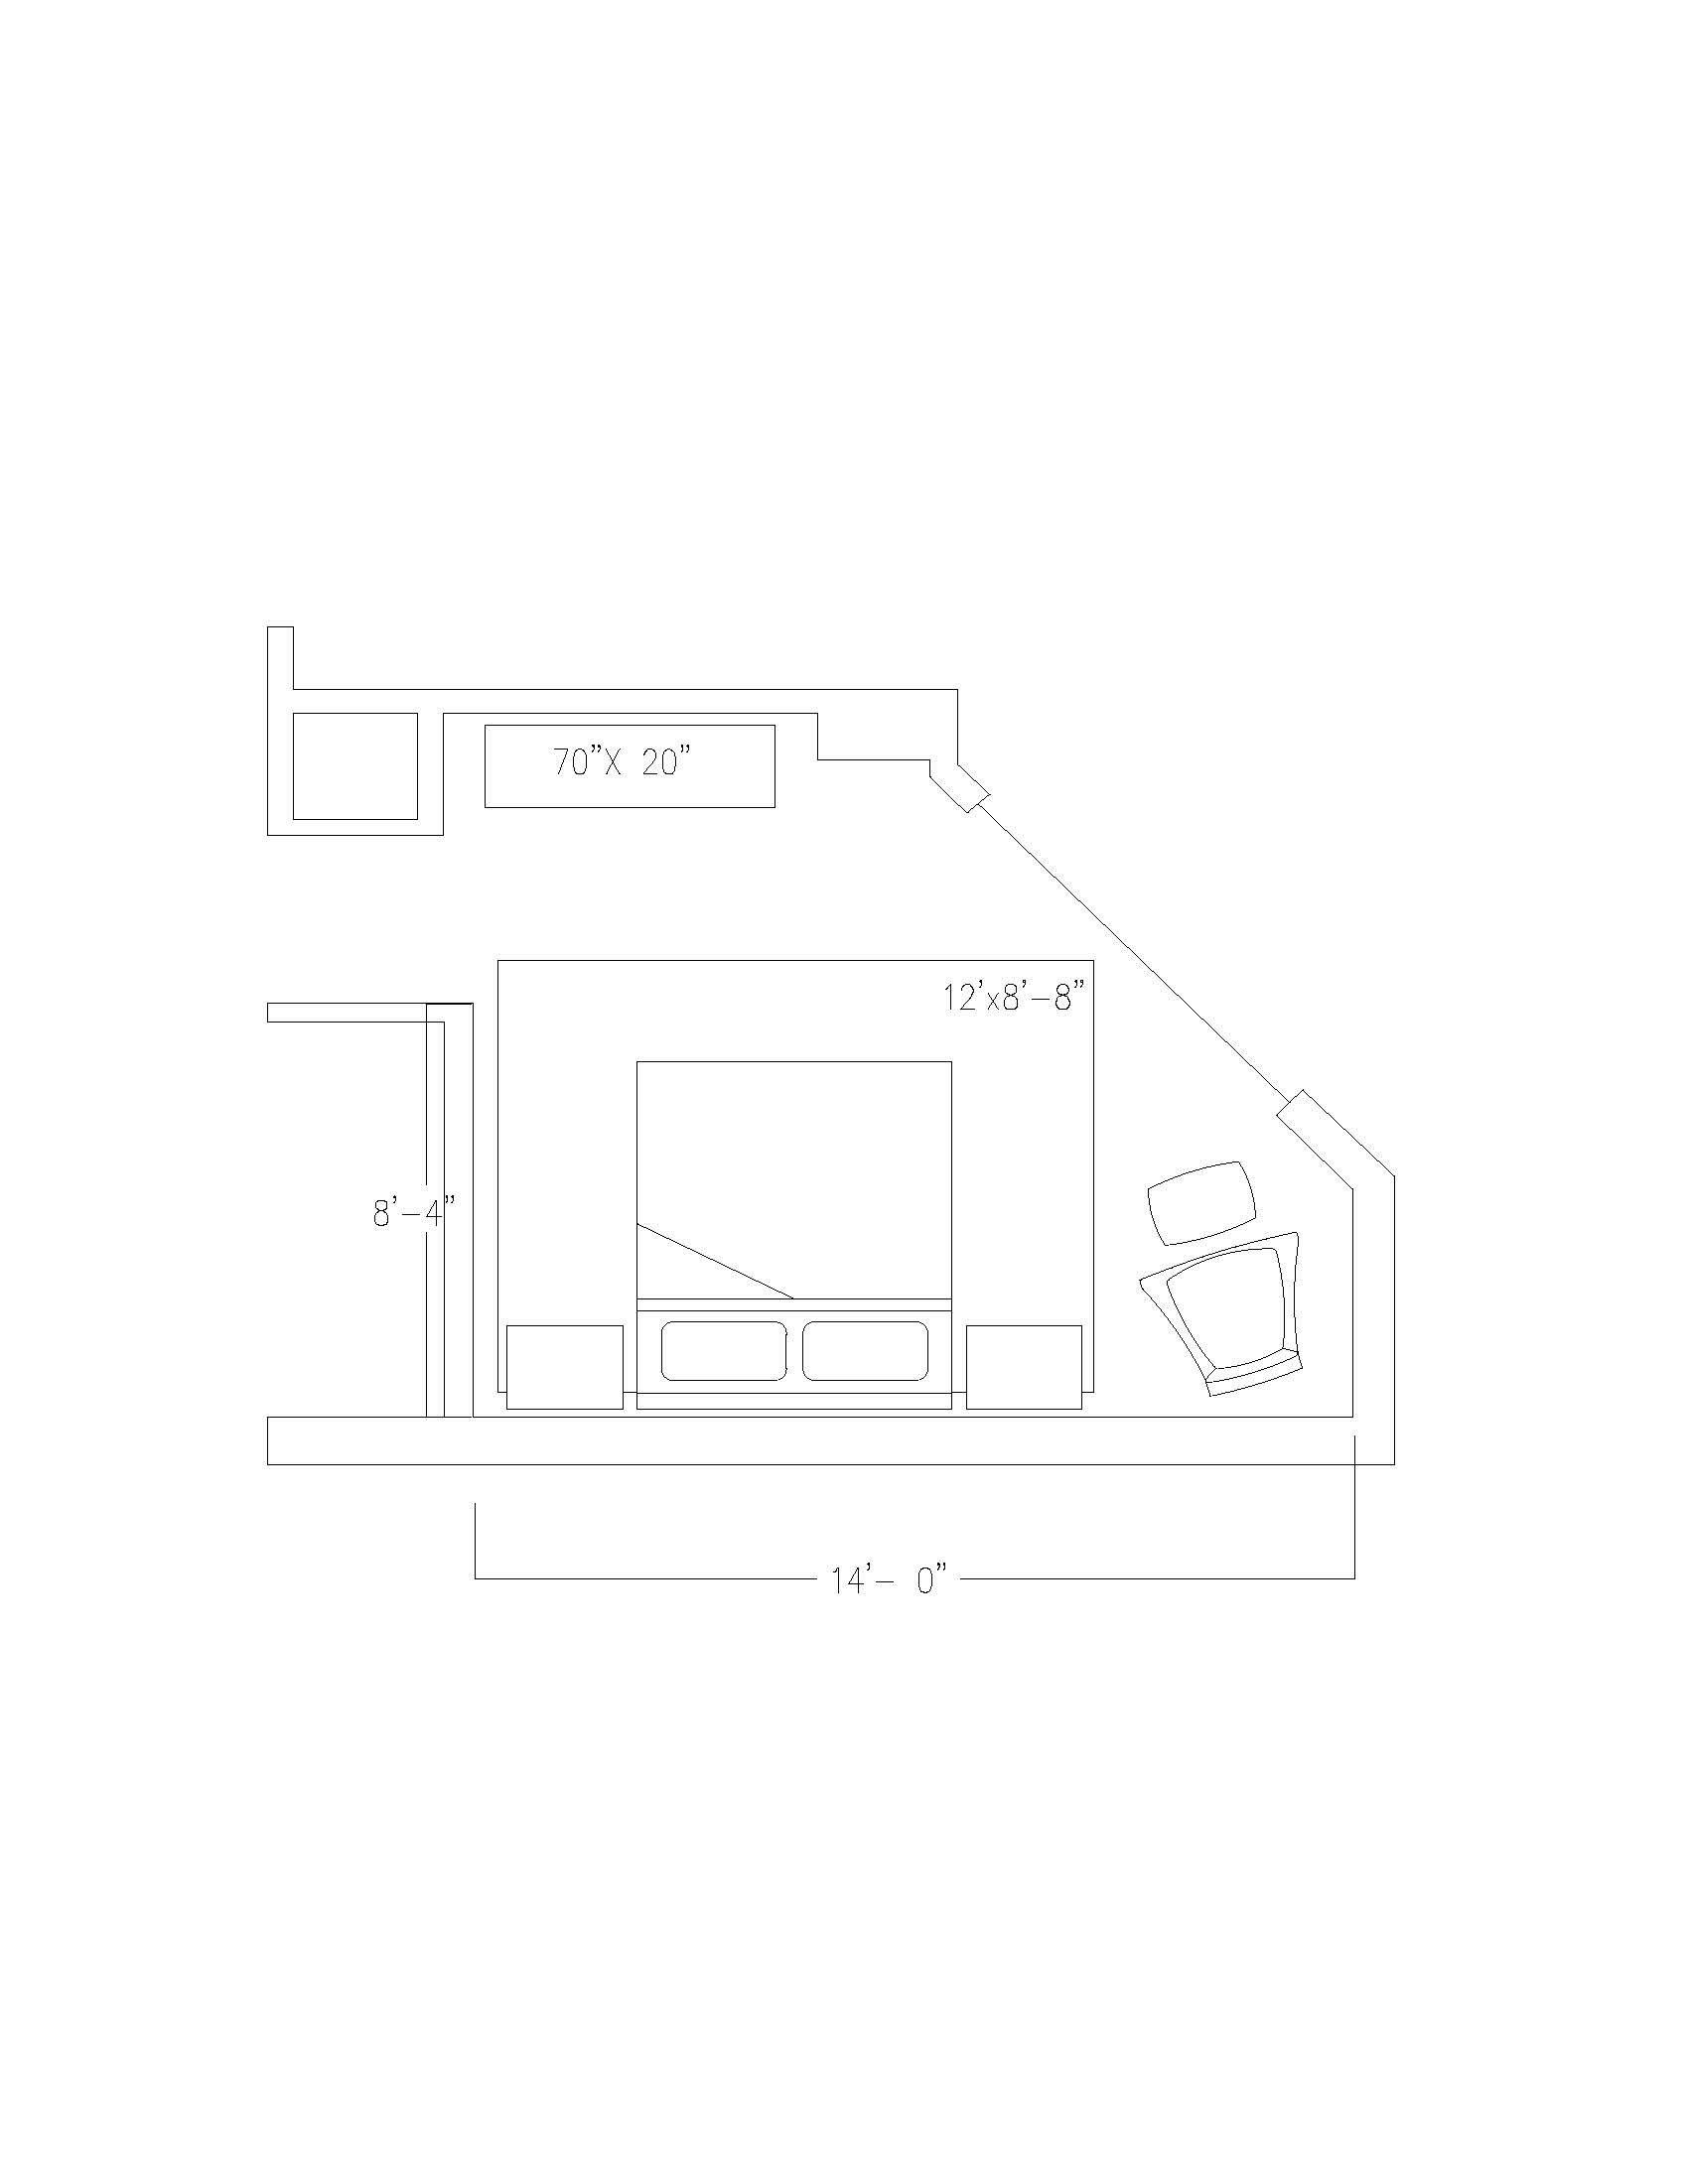 Master bedroom layout  Pin by Marcie Gorsline Designs Ltd on Palumbo  Pinterest  Master